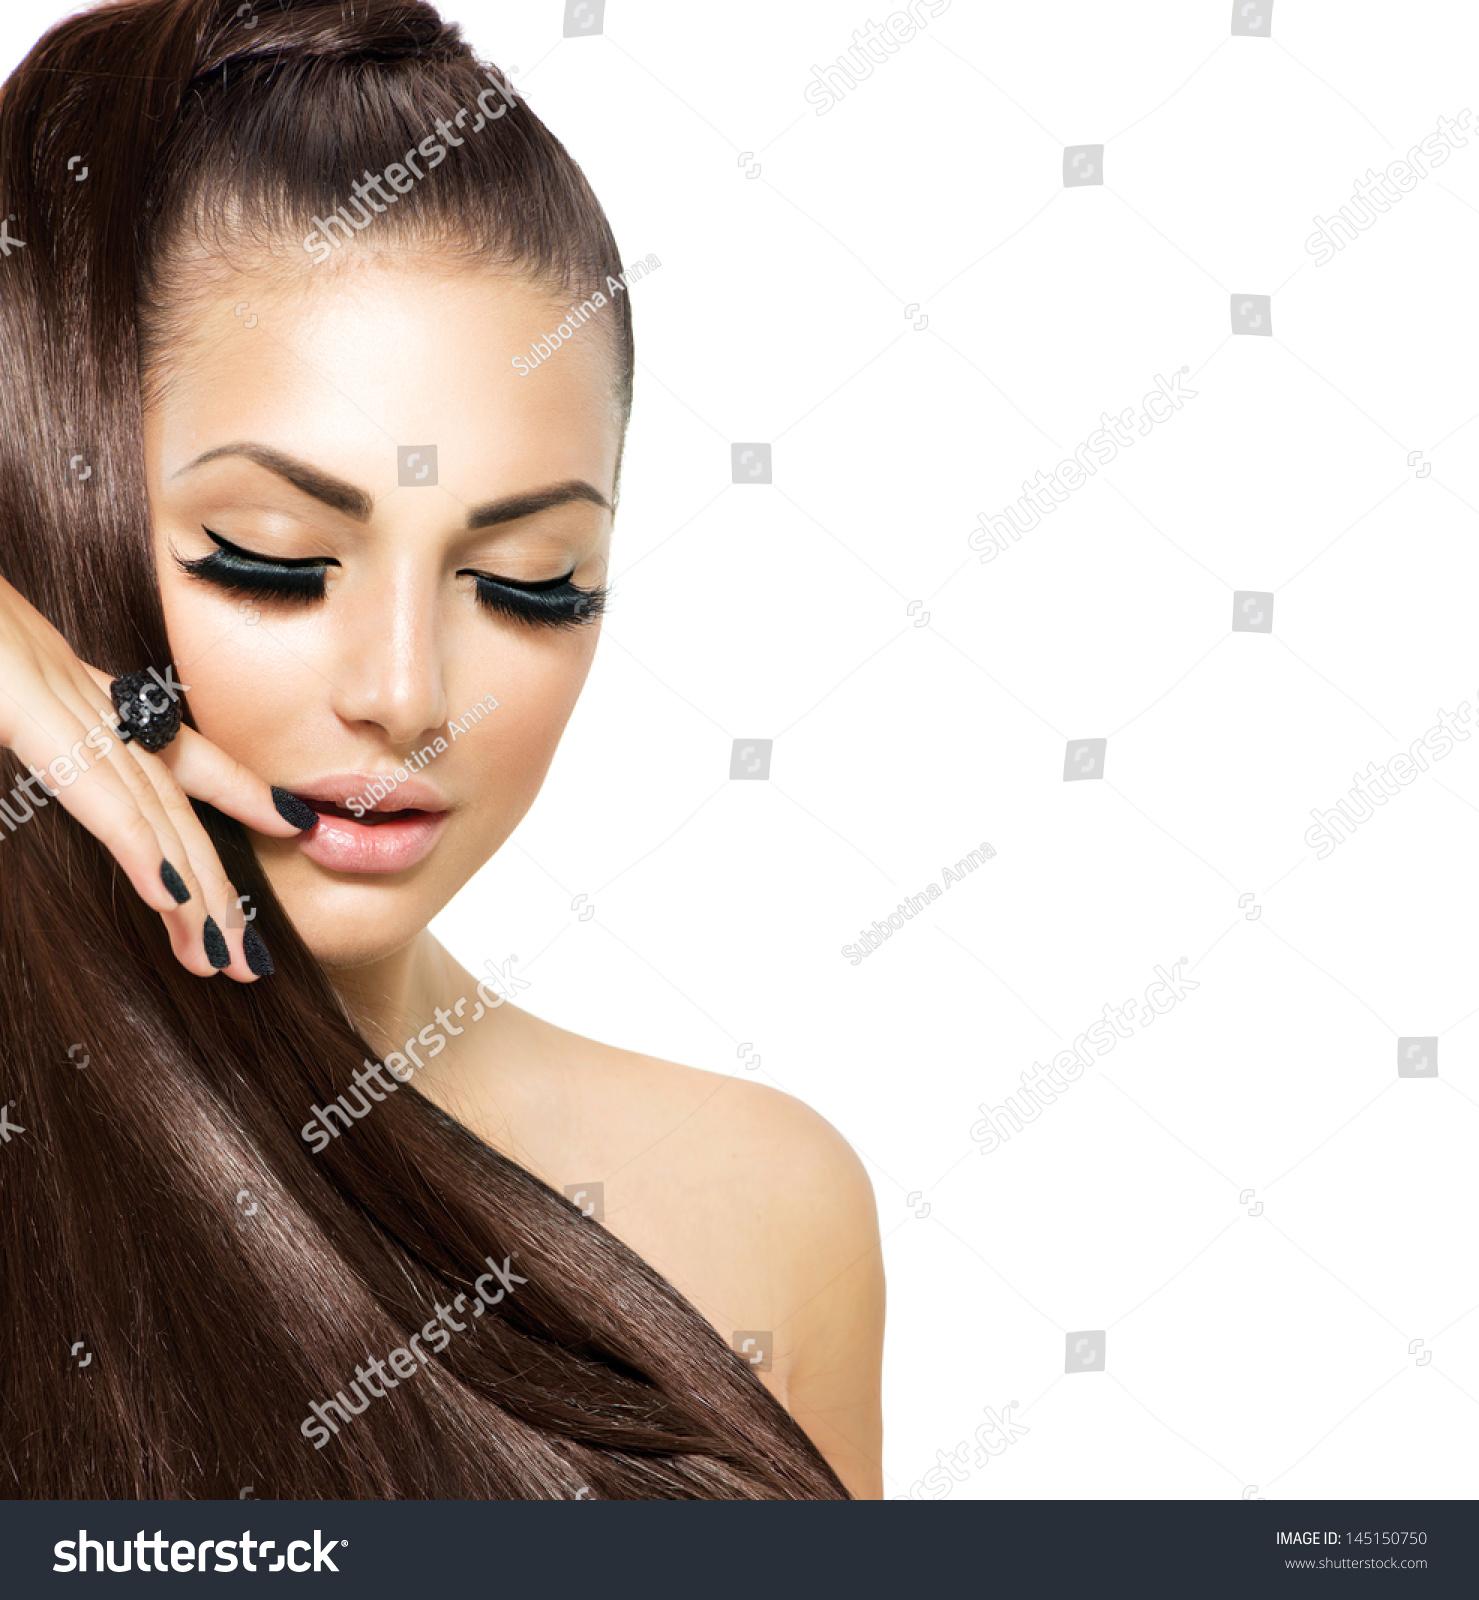 Fashion Beauty Model Girl Stock Image Image Of Manicured: Beauty Fashion Model Girl With Long Healthy Hair, Long